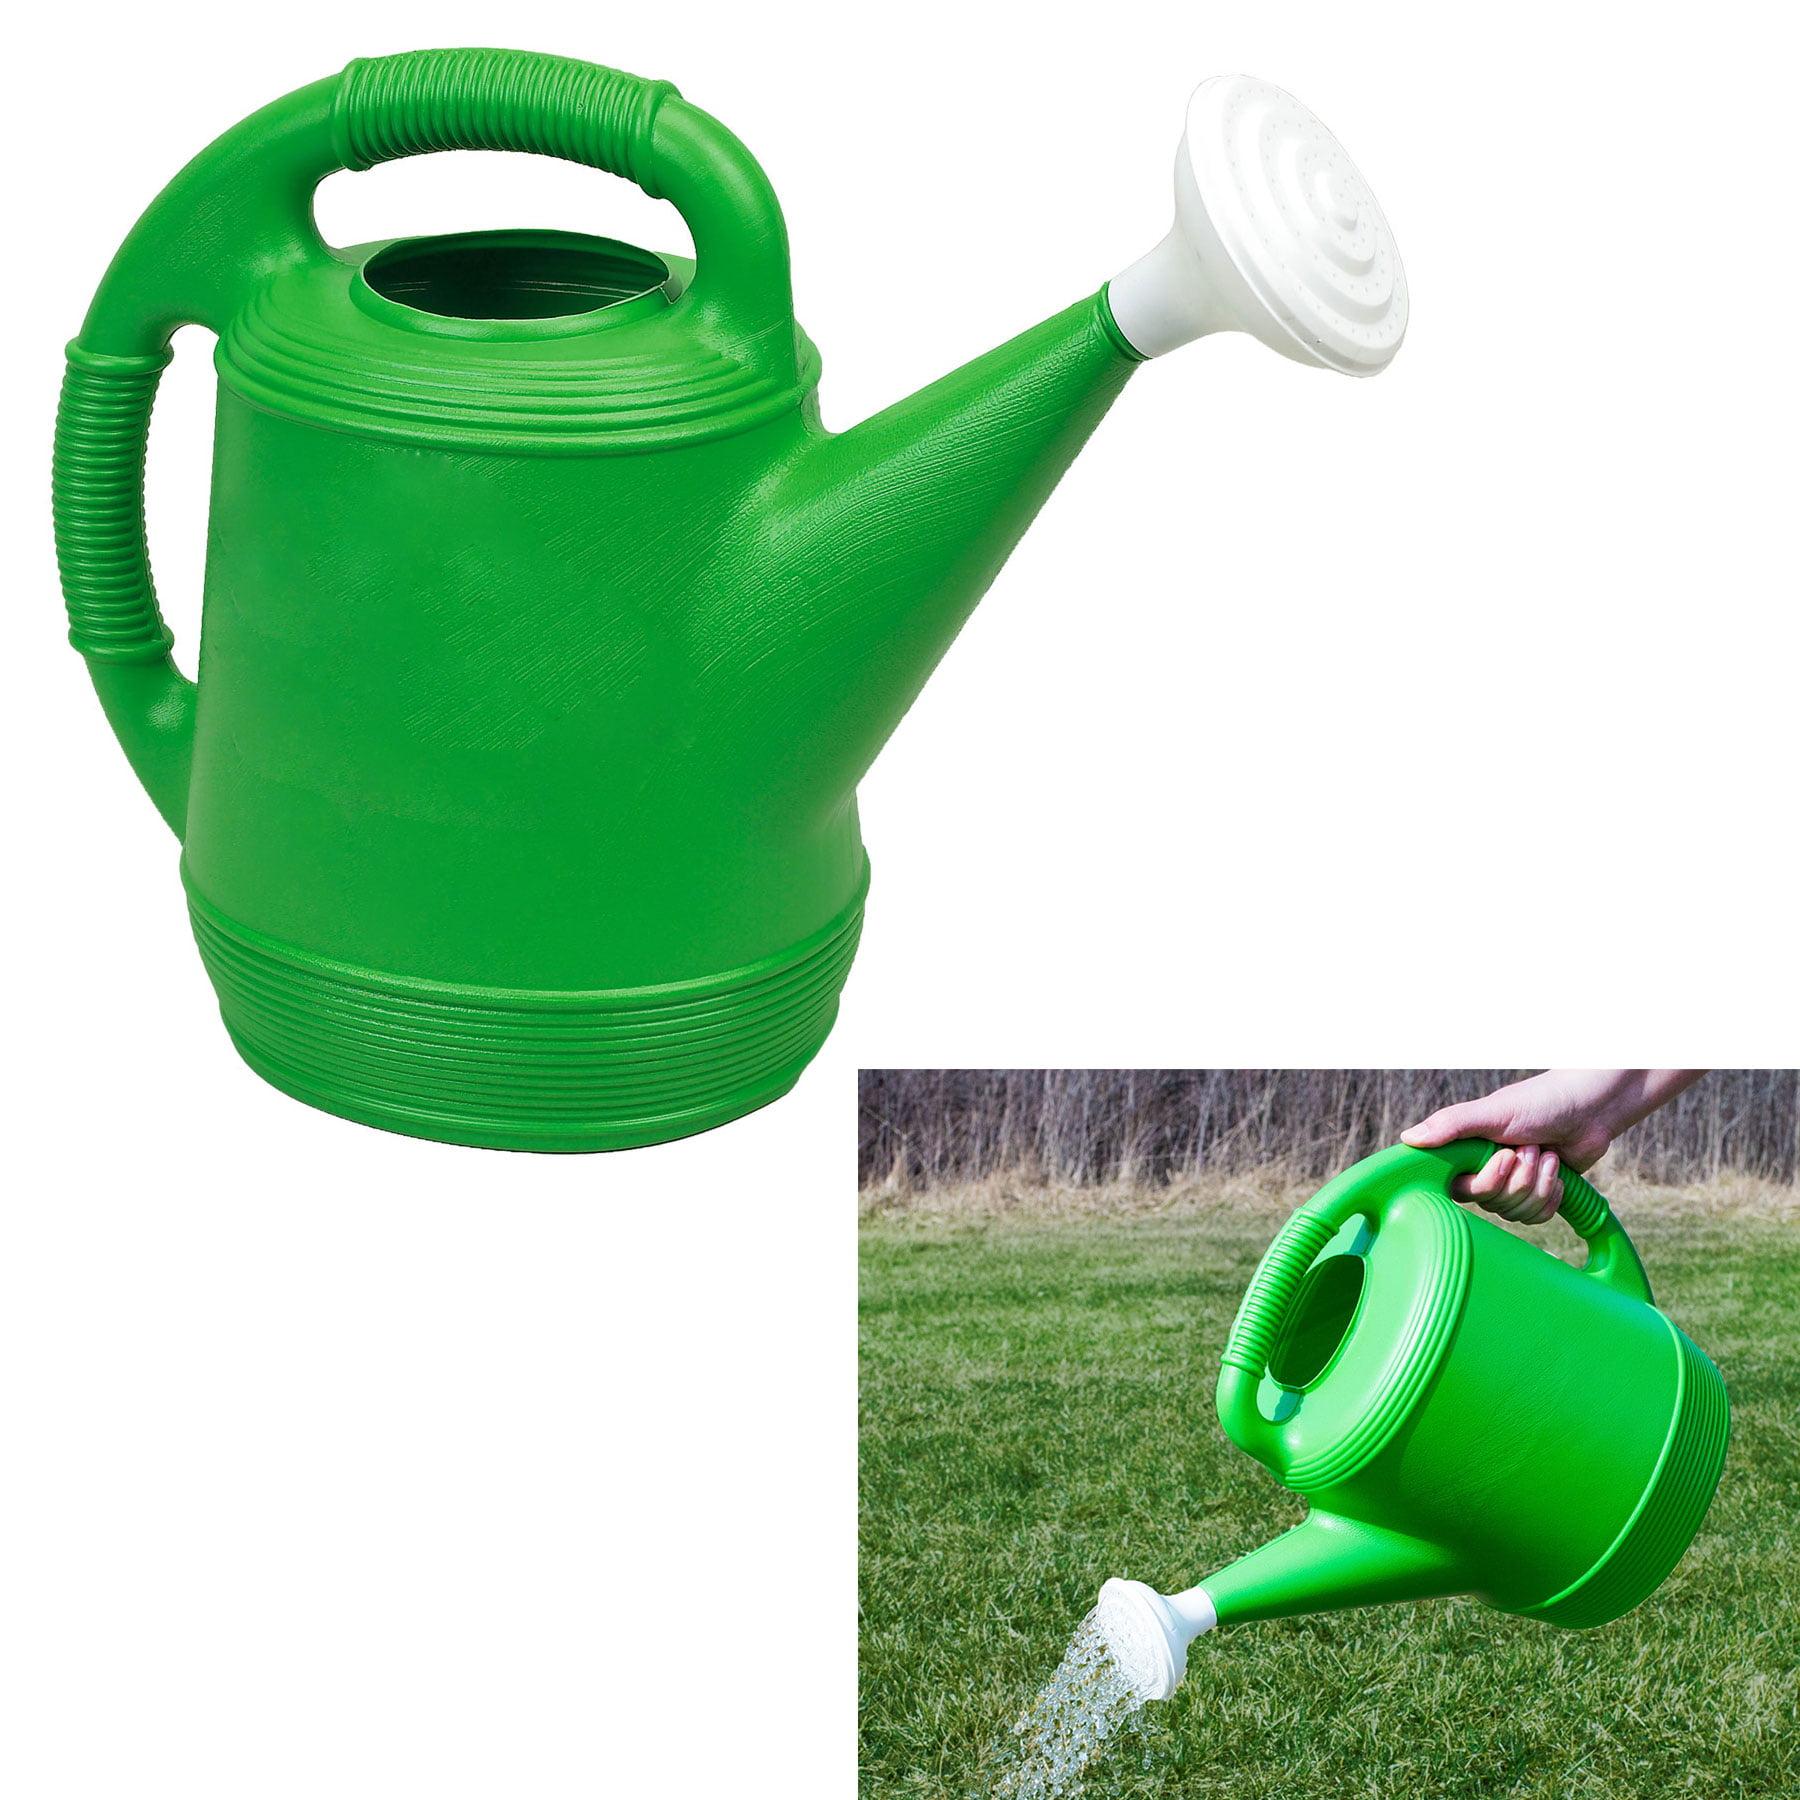 Classic Gardeners 2 Gallon Green Plastic Watering Can Indoor Outdoor by